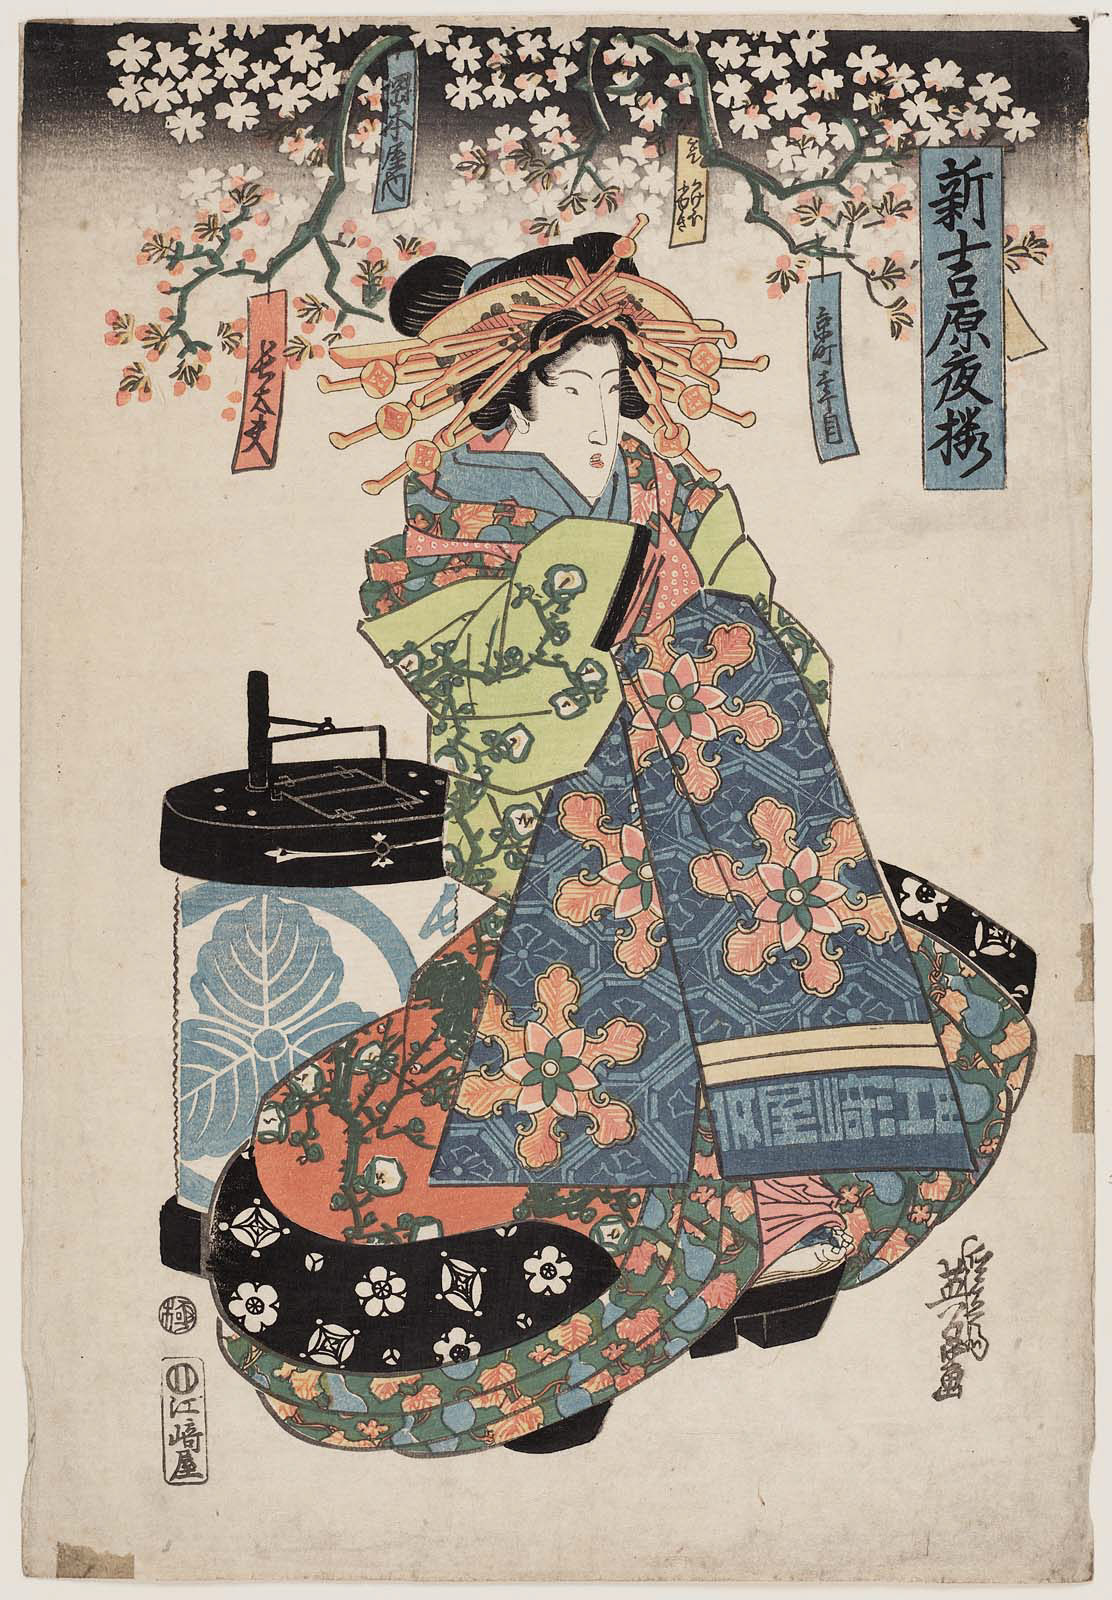 Картинки по запросу chôdayû of the okamotoya, kamuro kakeo and koyuki